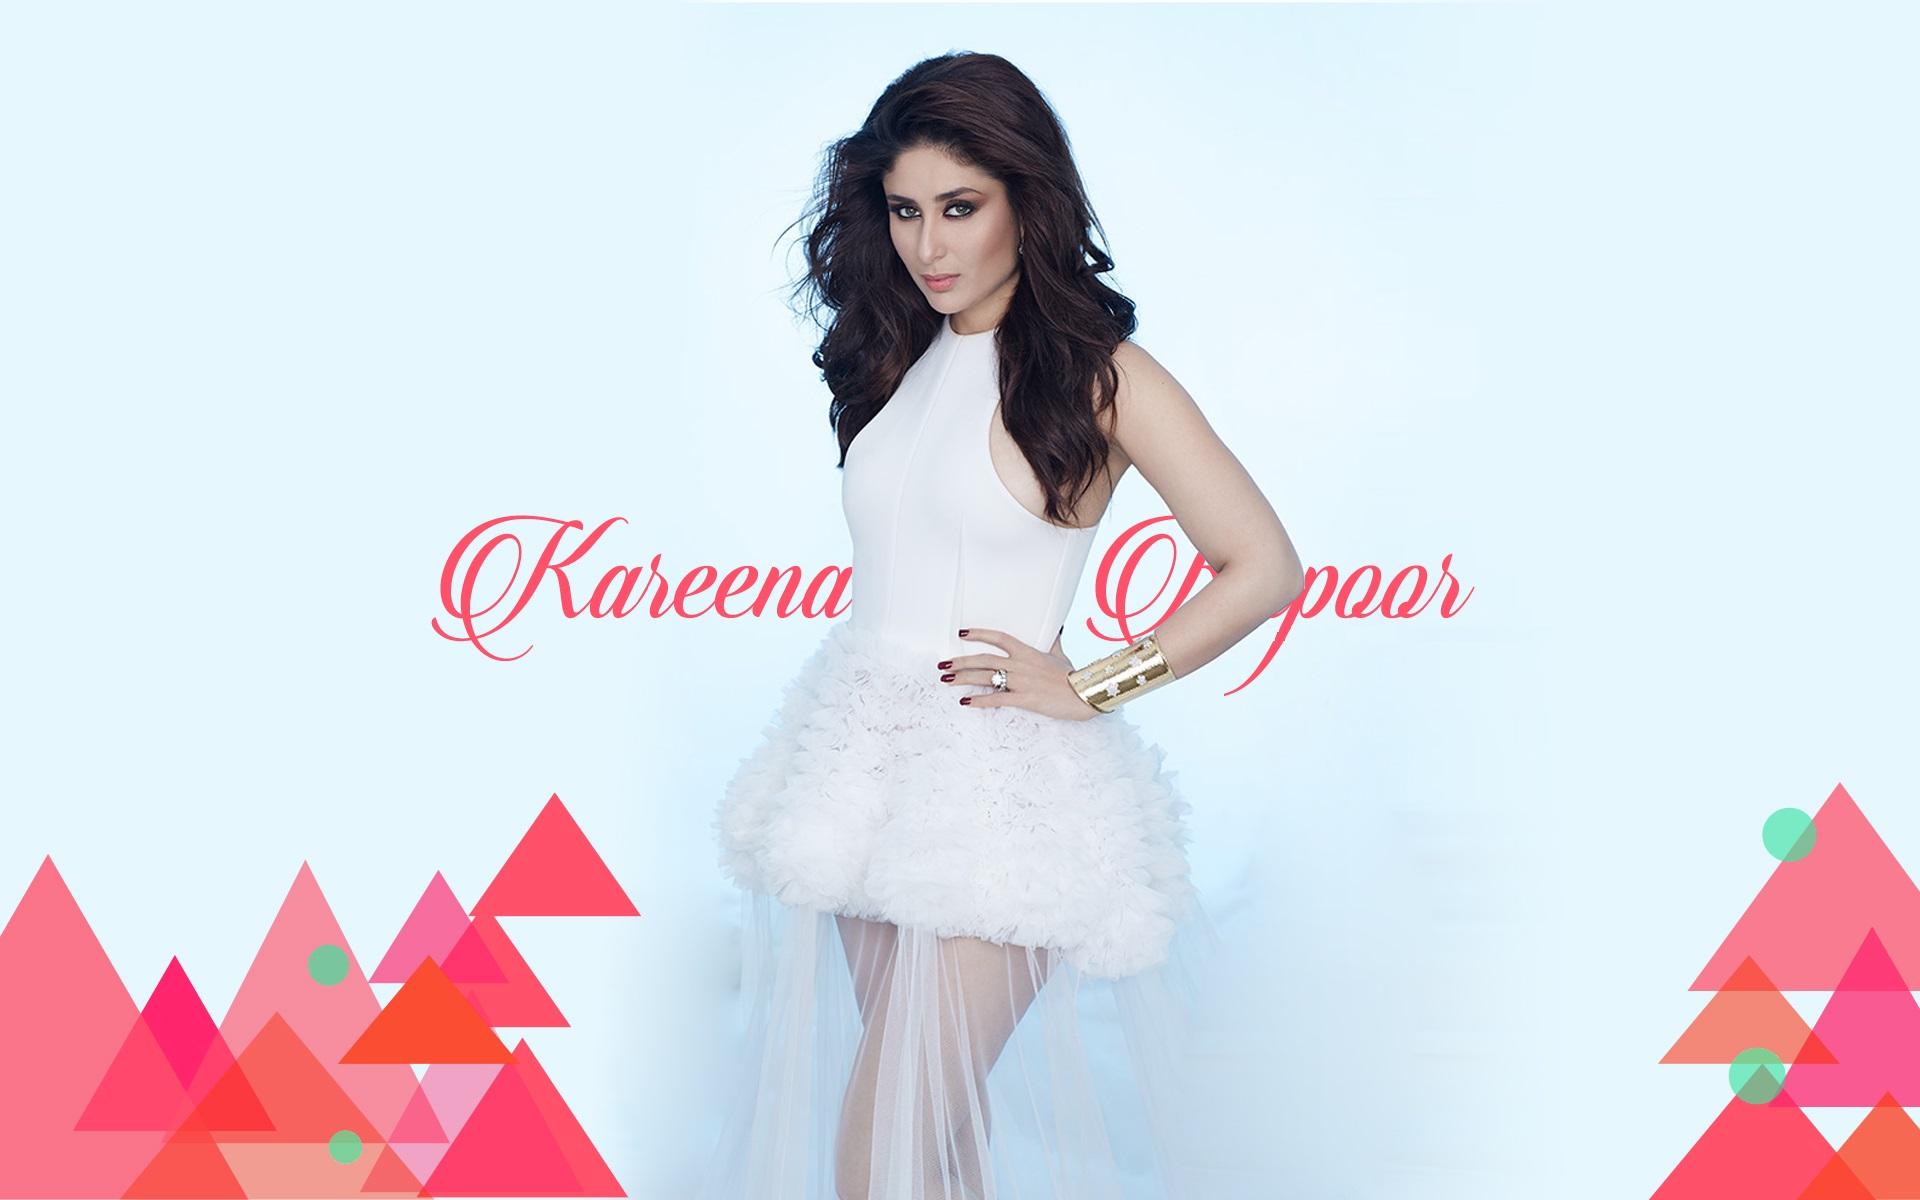 Kareena Kapoor Wallpapers 2015jpg 1920x1200